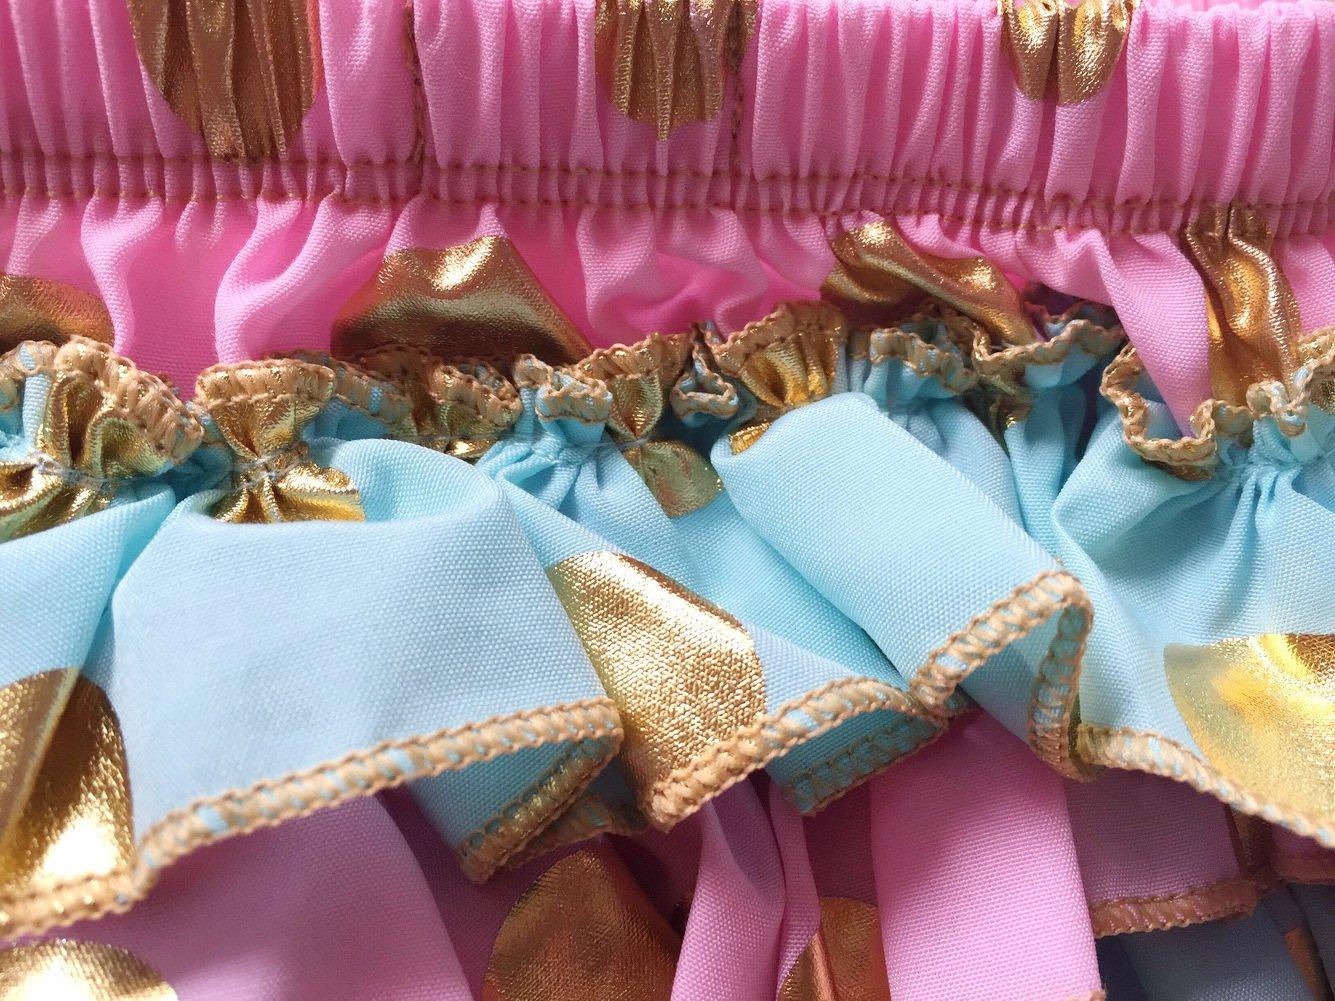 Messy Code Girls Briefs Sweet Gold polka dot Bloomer KP-BGPB01-CA